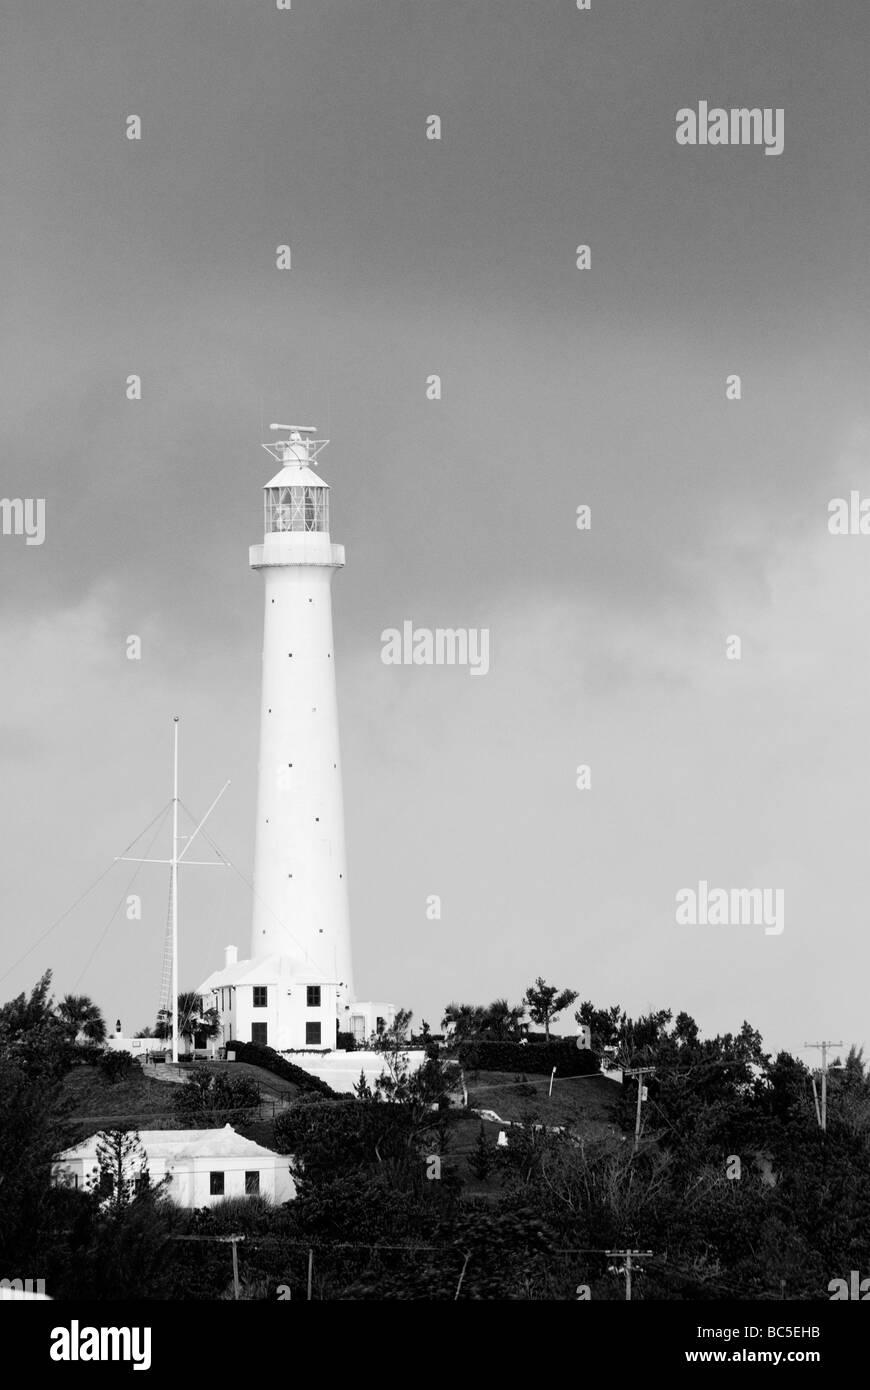 The Gibbs Hill Lighthouse Hamilton Bermuda - Stock Image